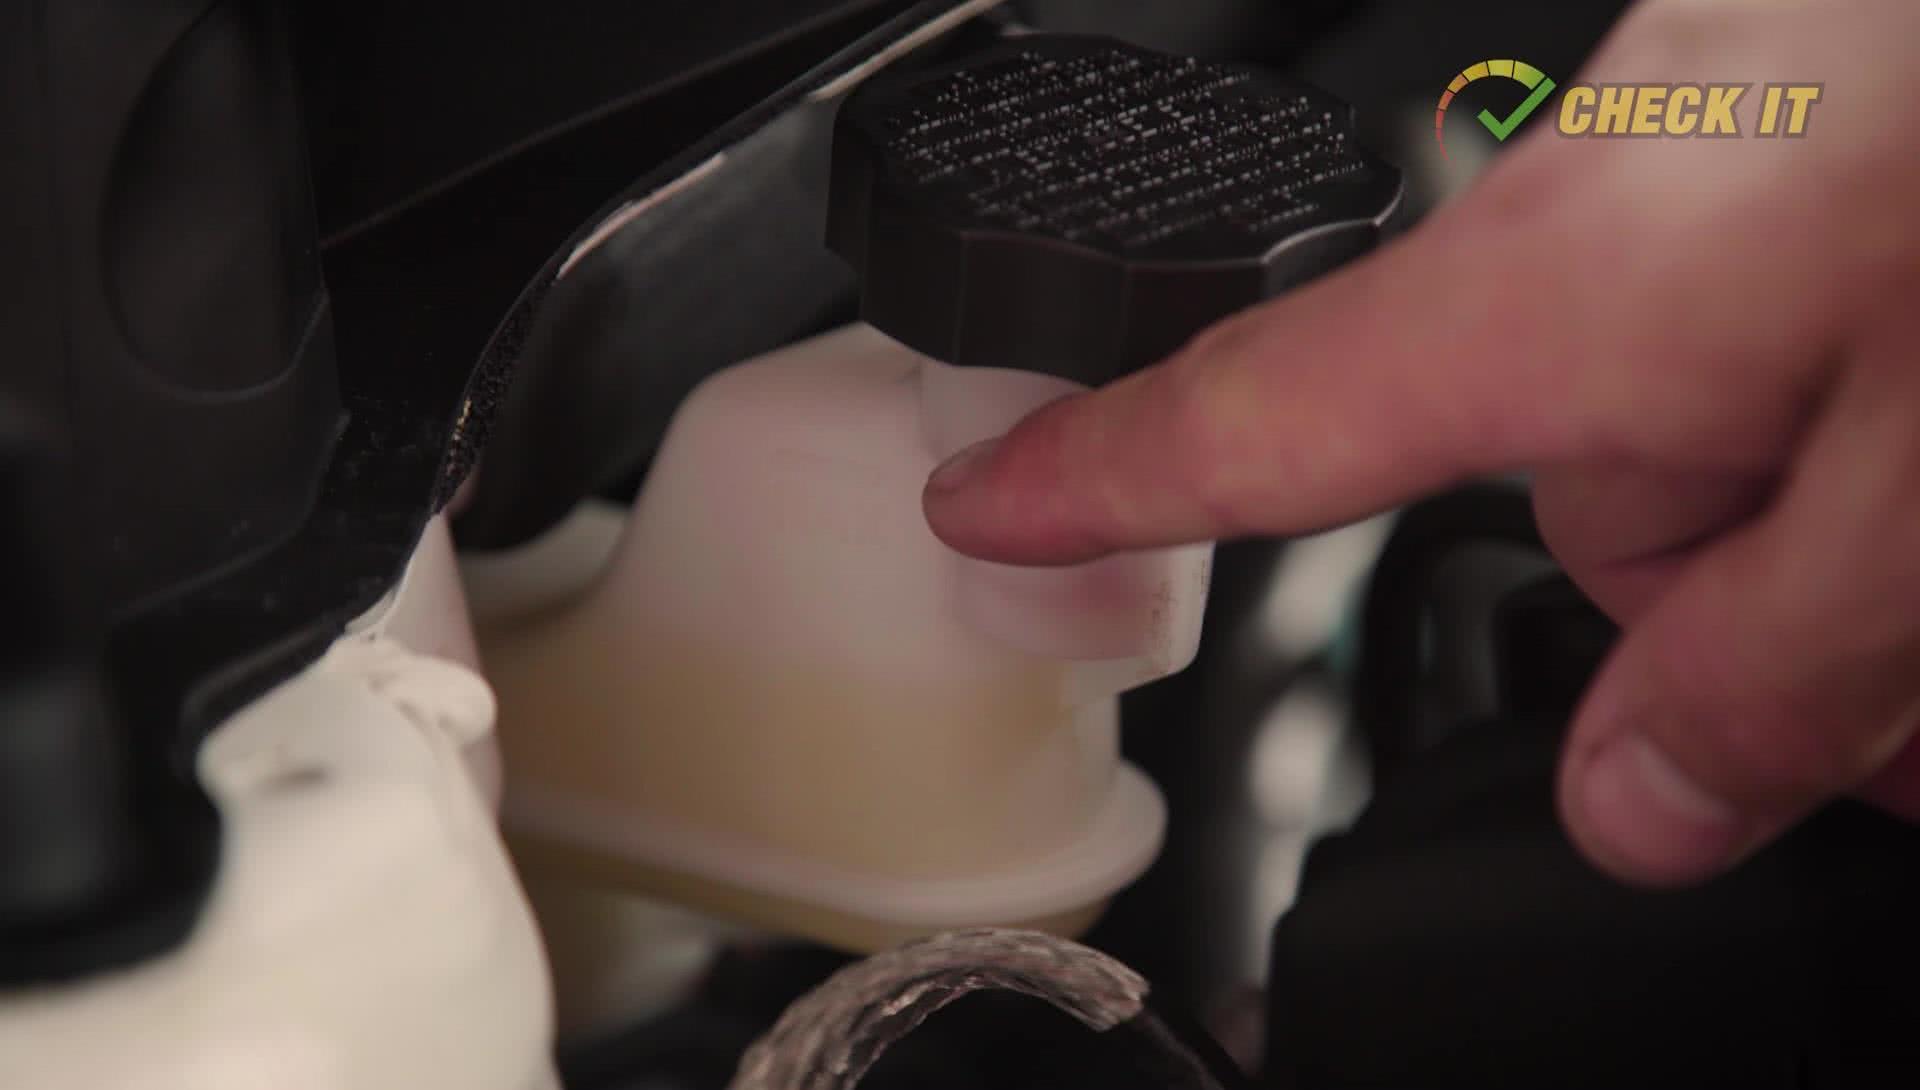 Step 2 - Brake Fluid